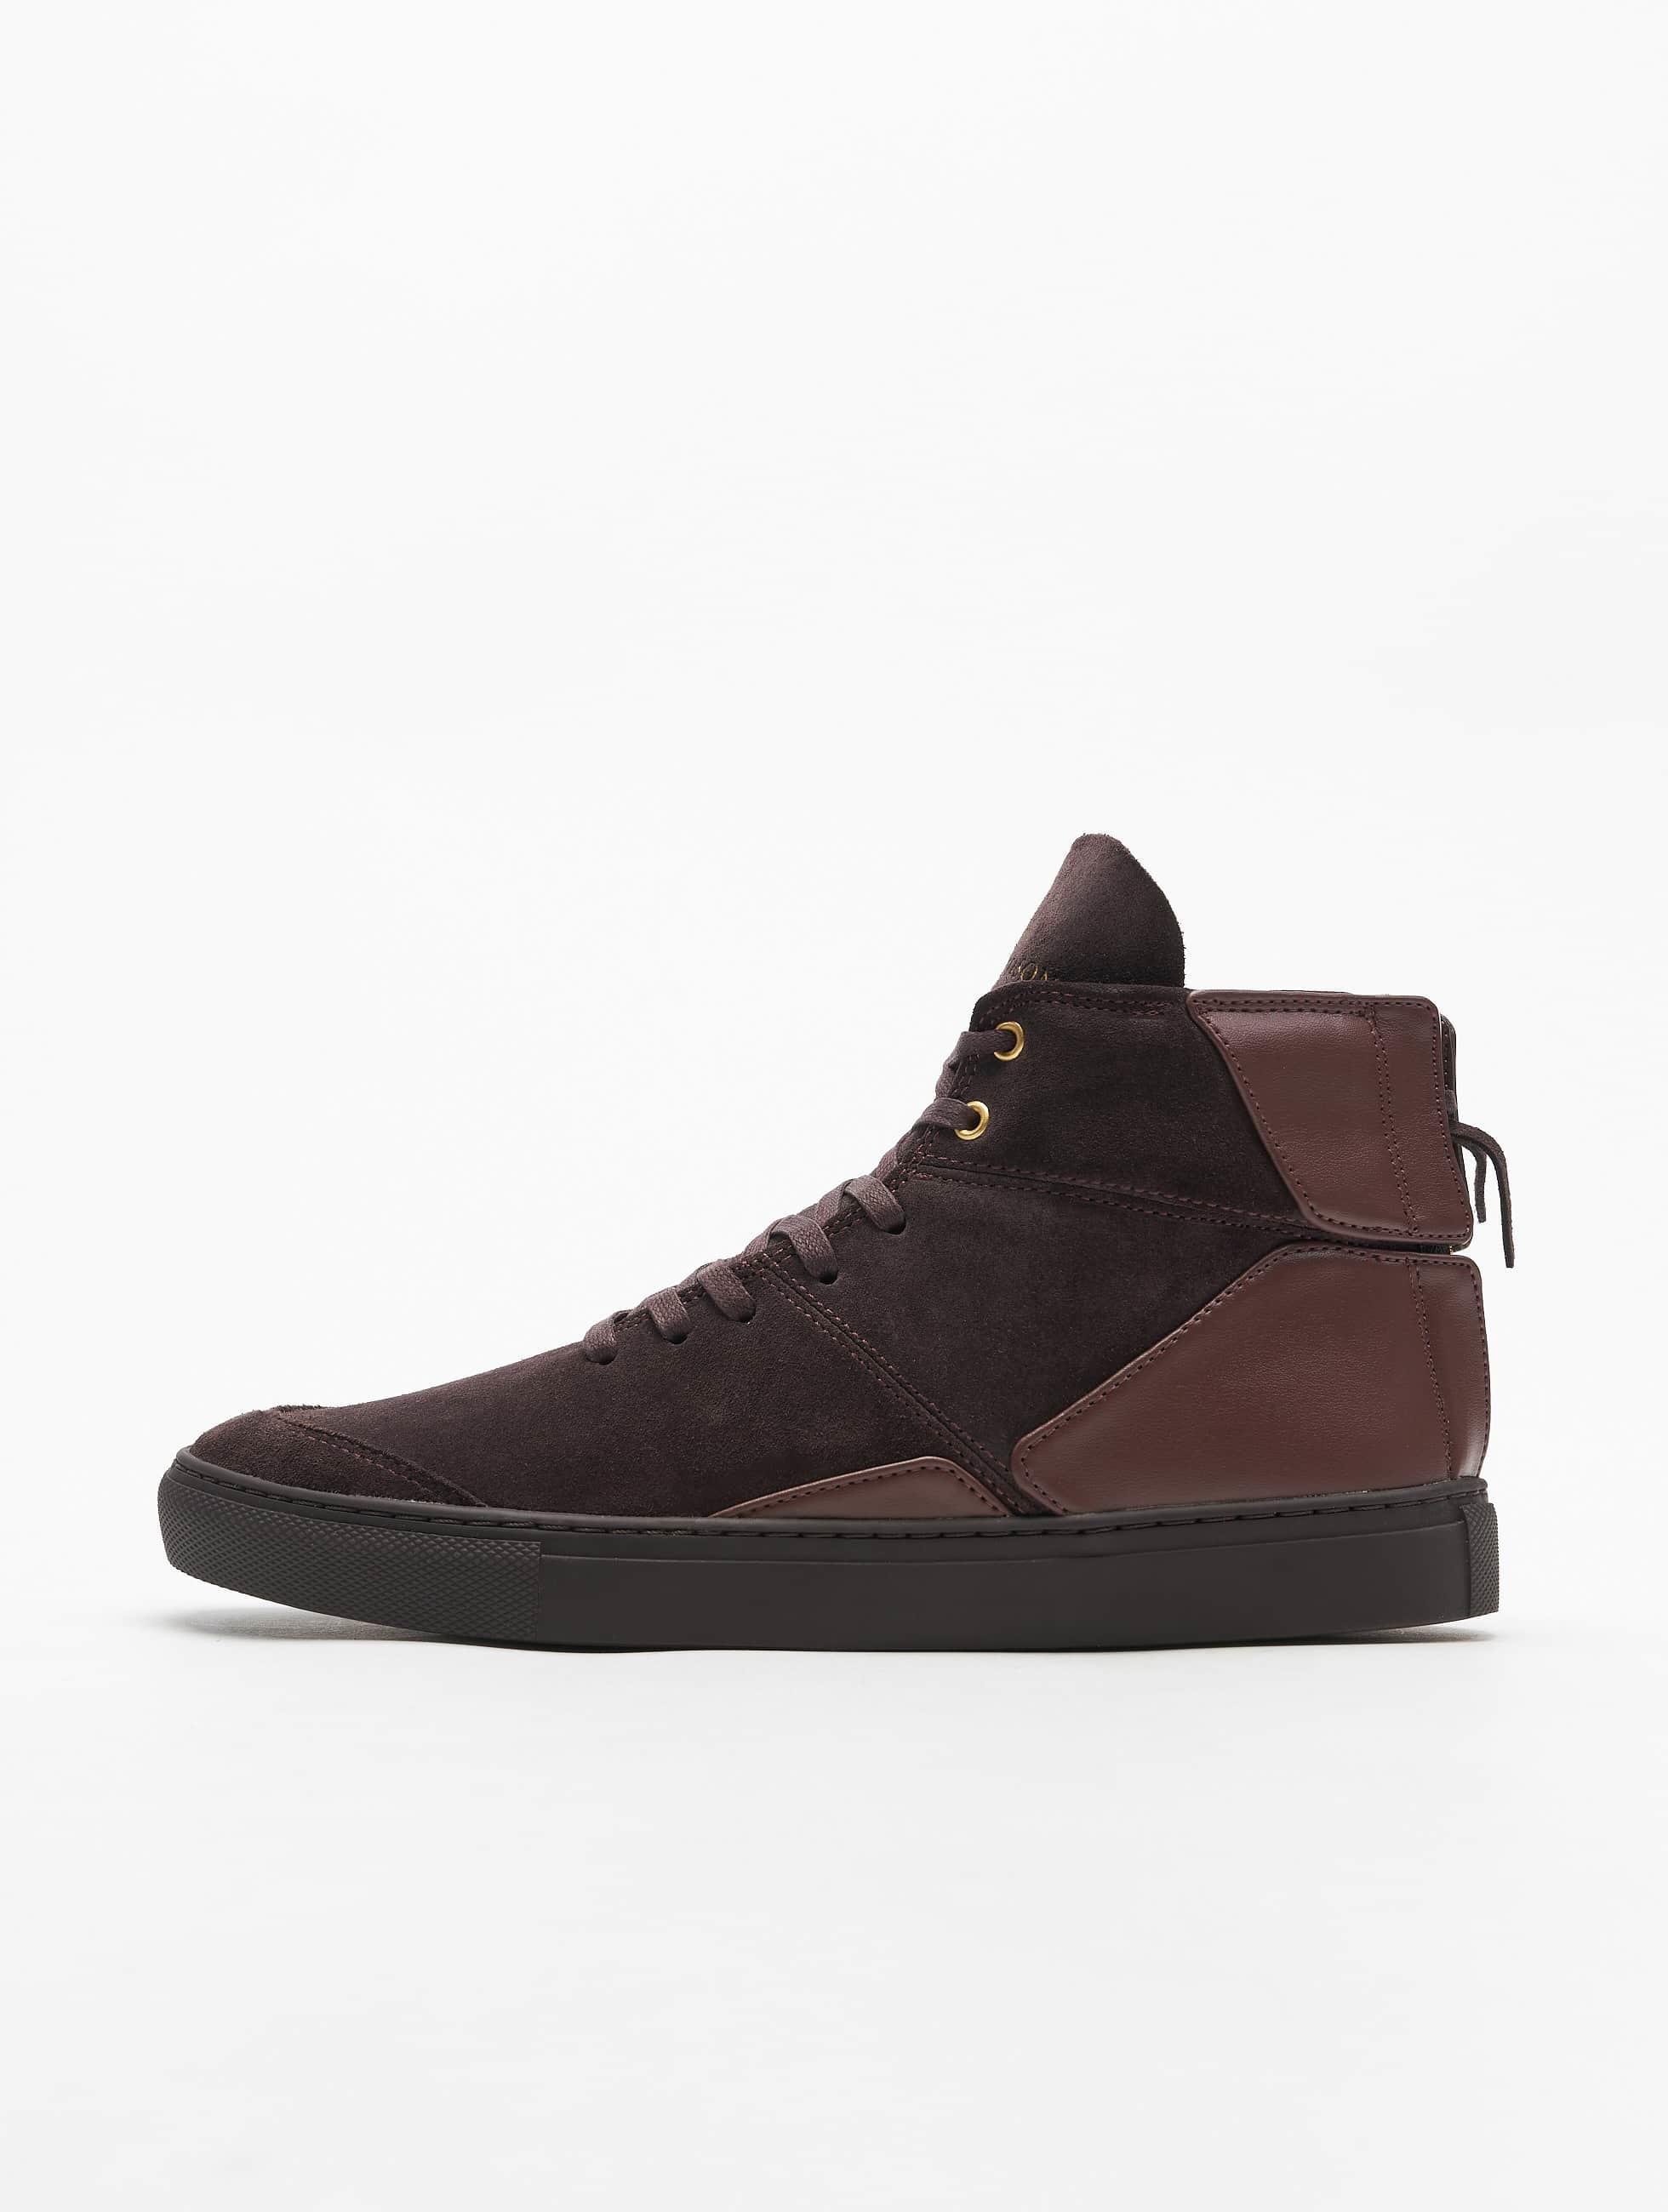 Cayler & Sons Schuhe / Sneaker Hamachi in braun